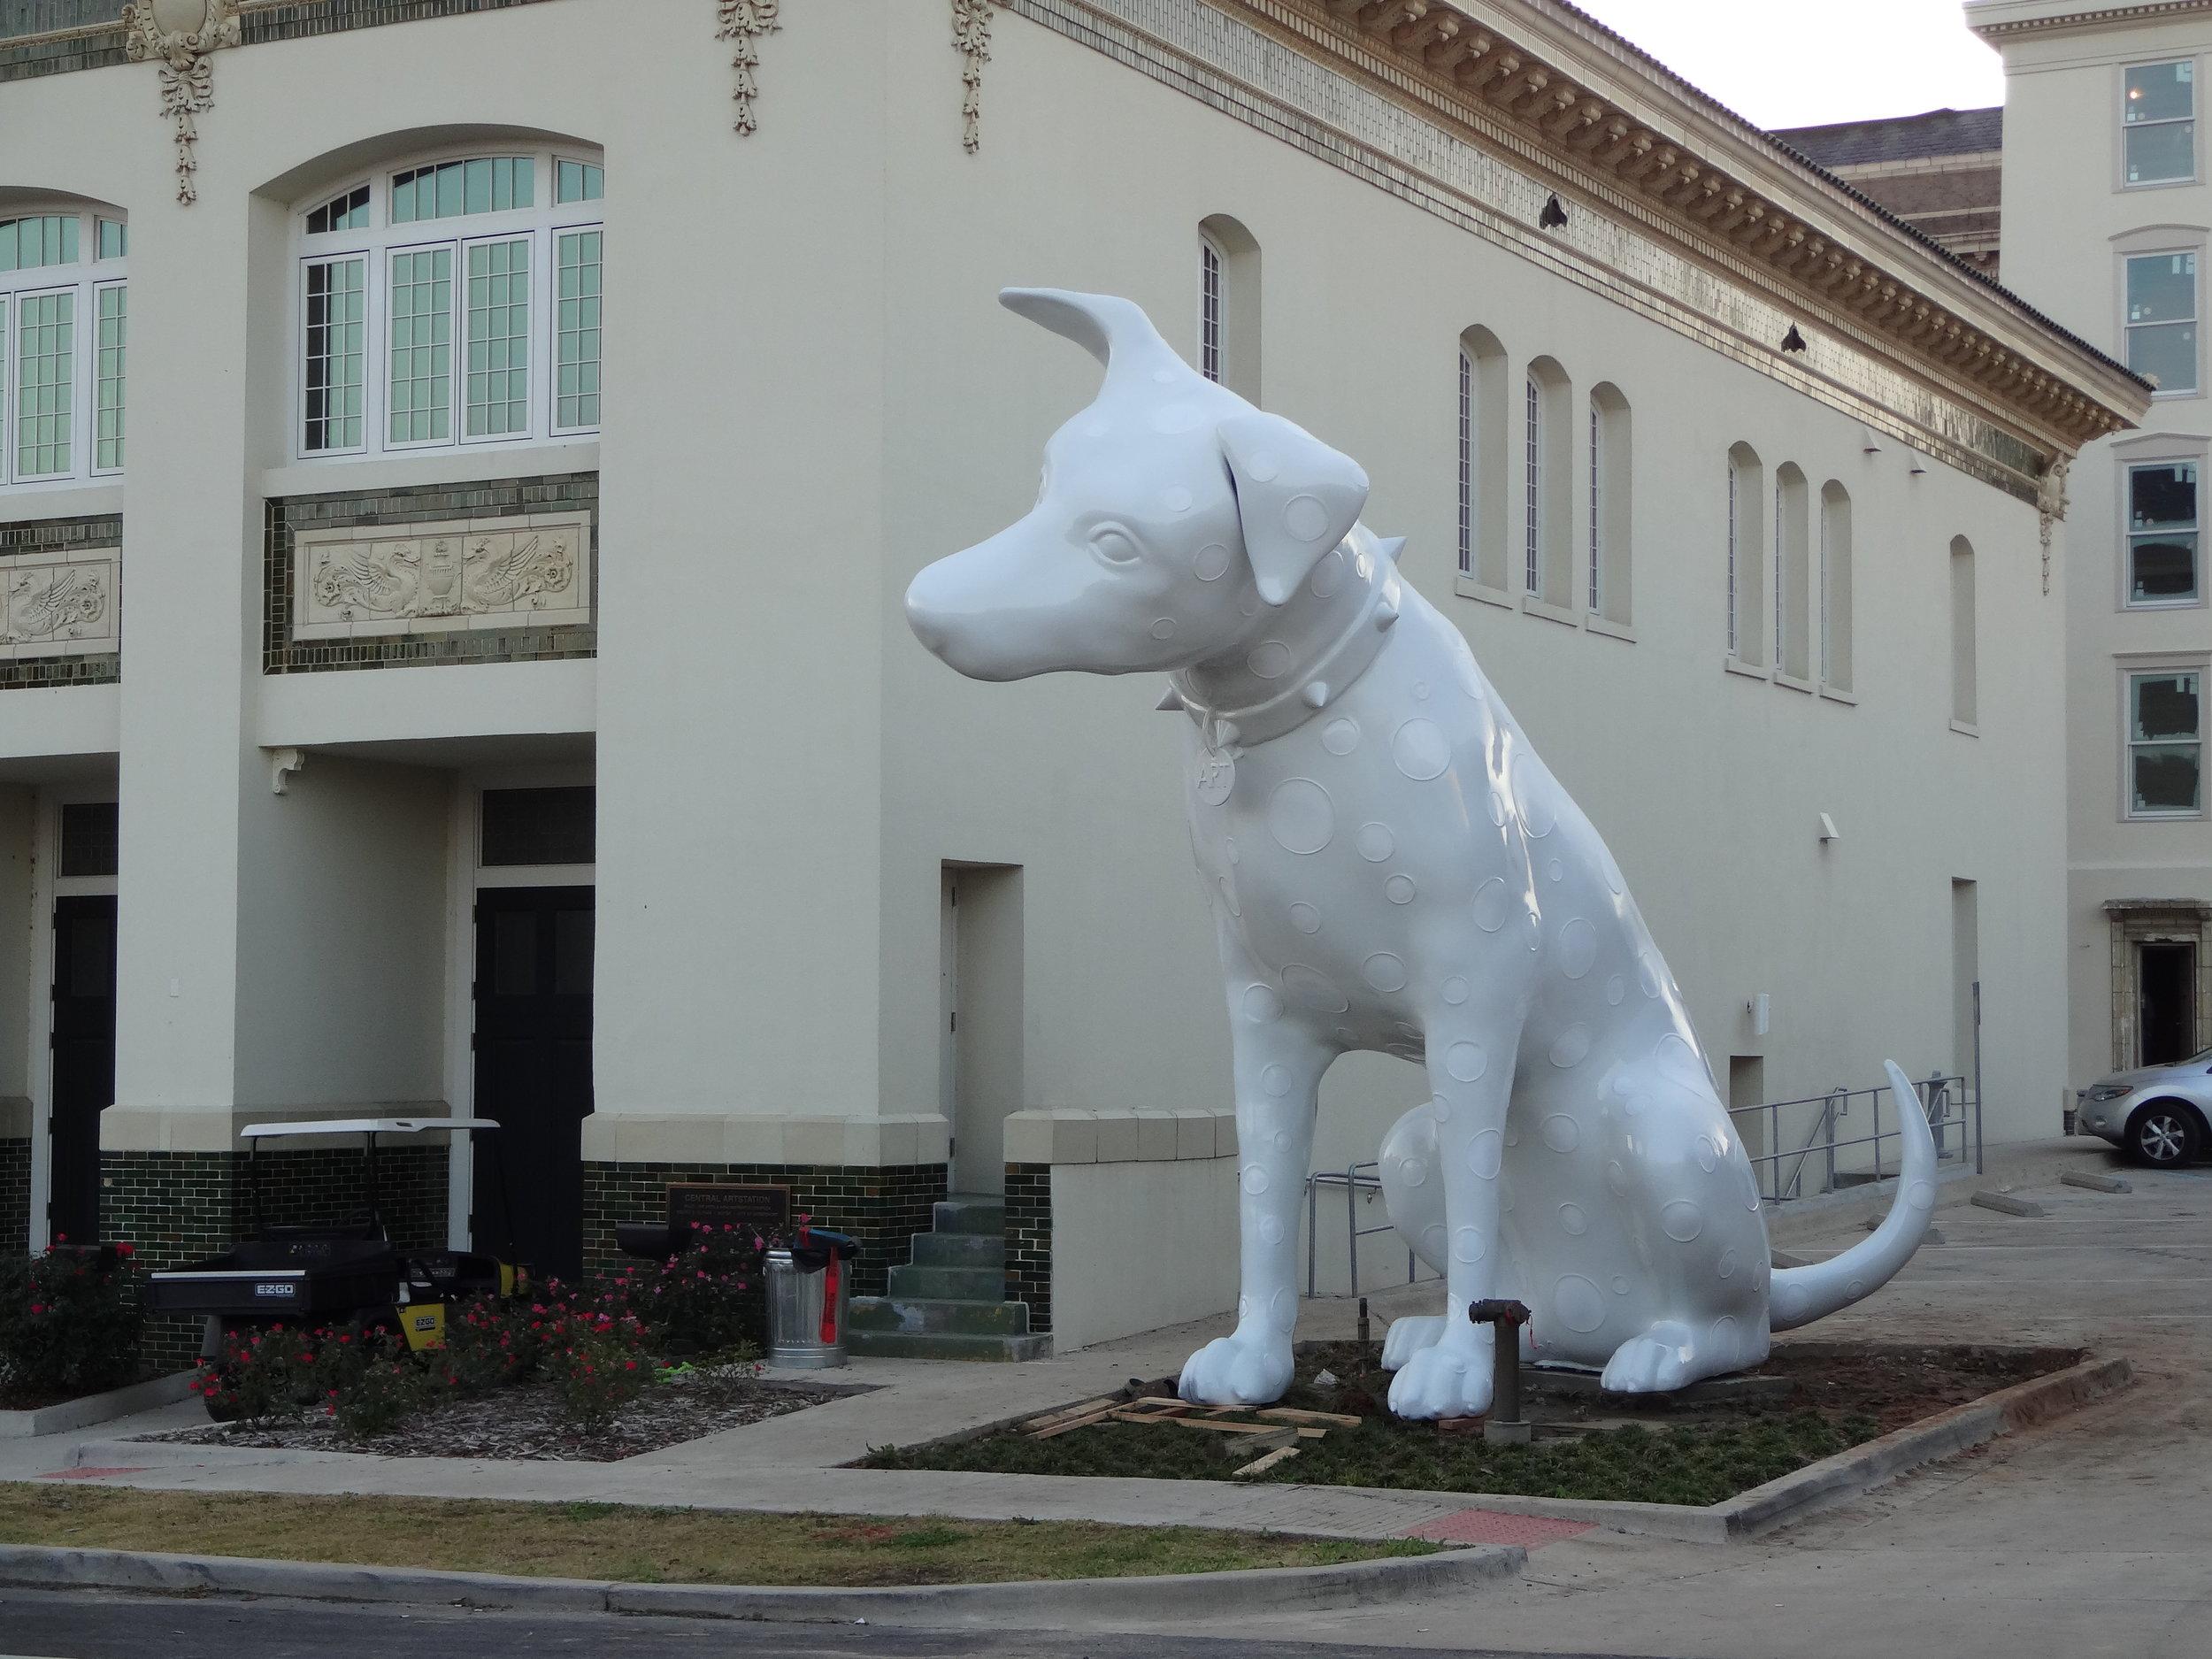 Shreveport_Art the Dalmation_Shreveport Regional Arts Council_Public Art Services_J Grant Projects_5.JPG